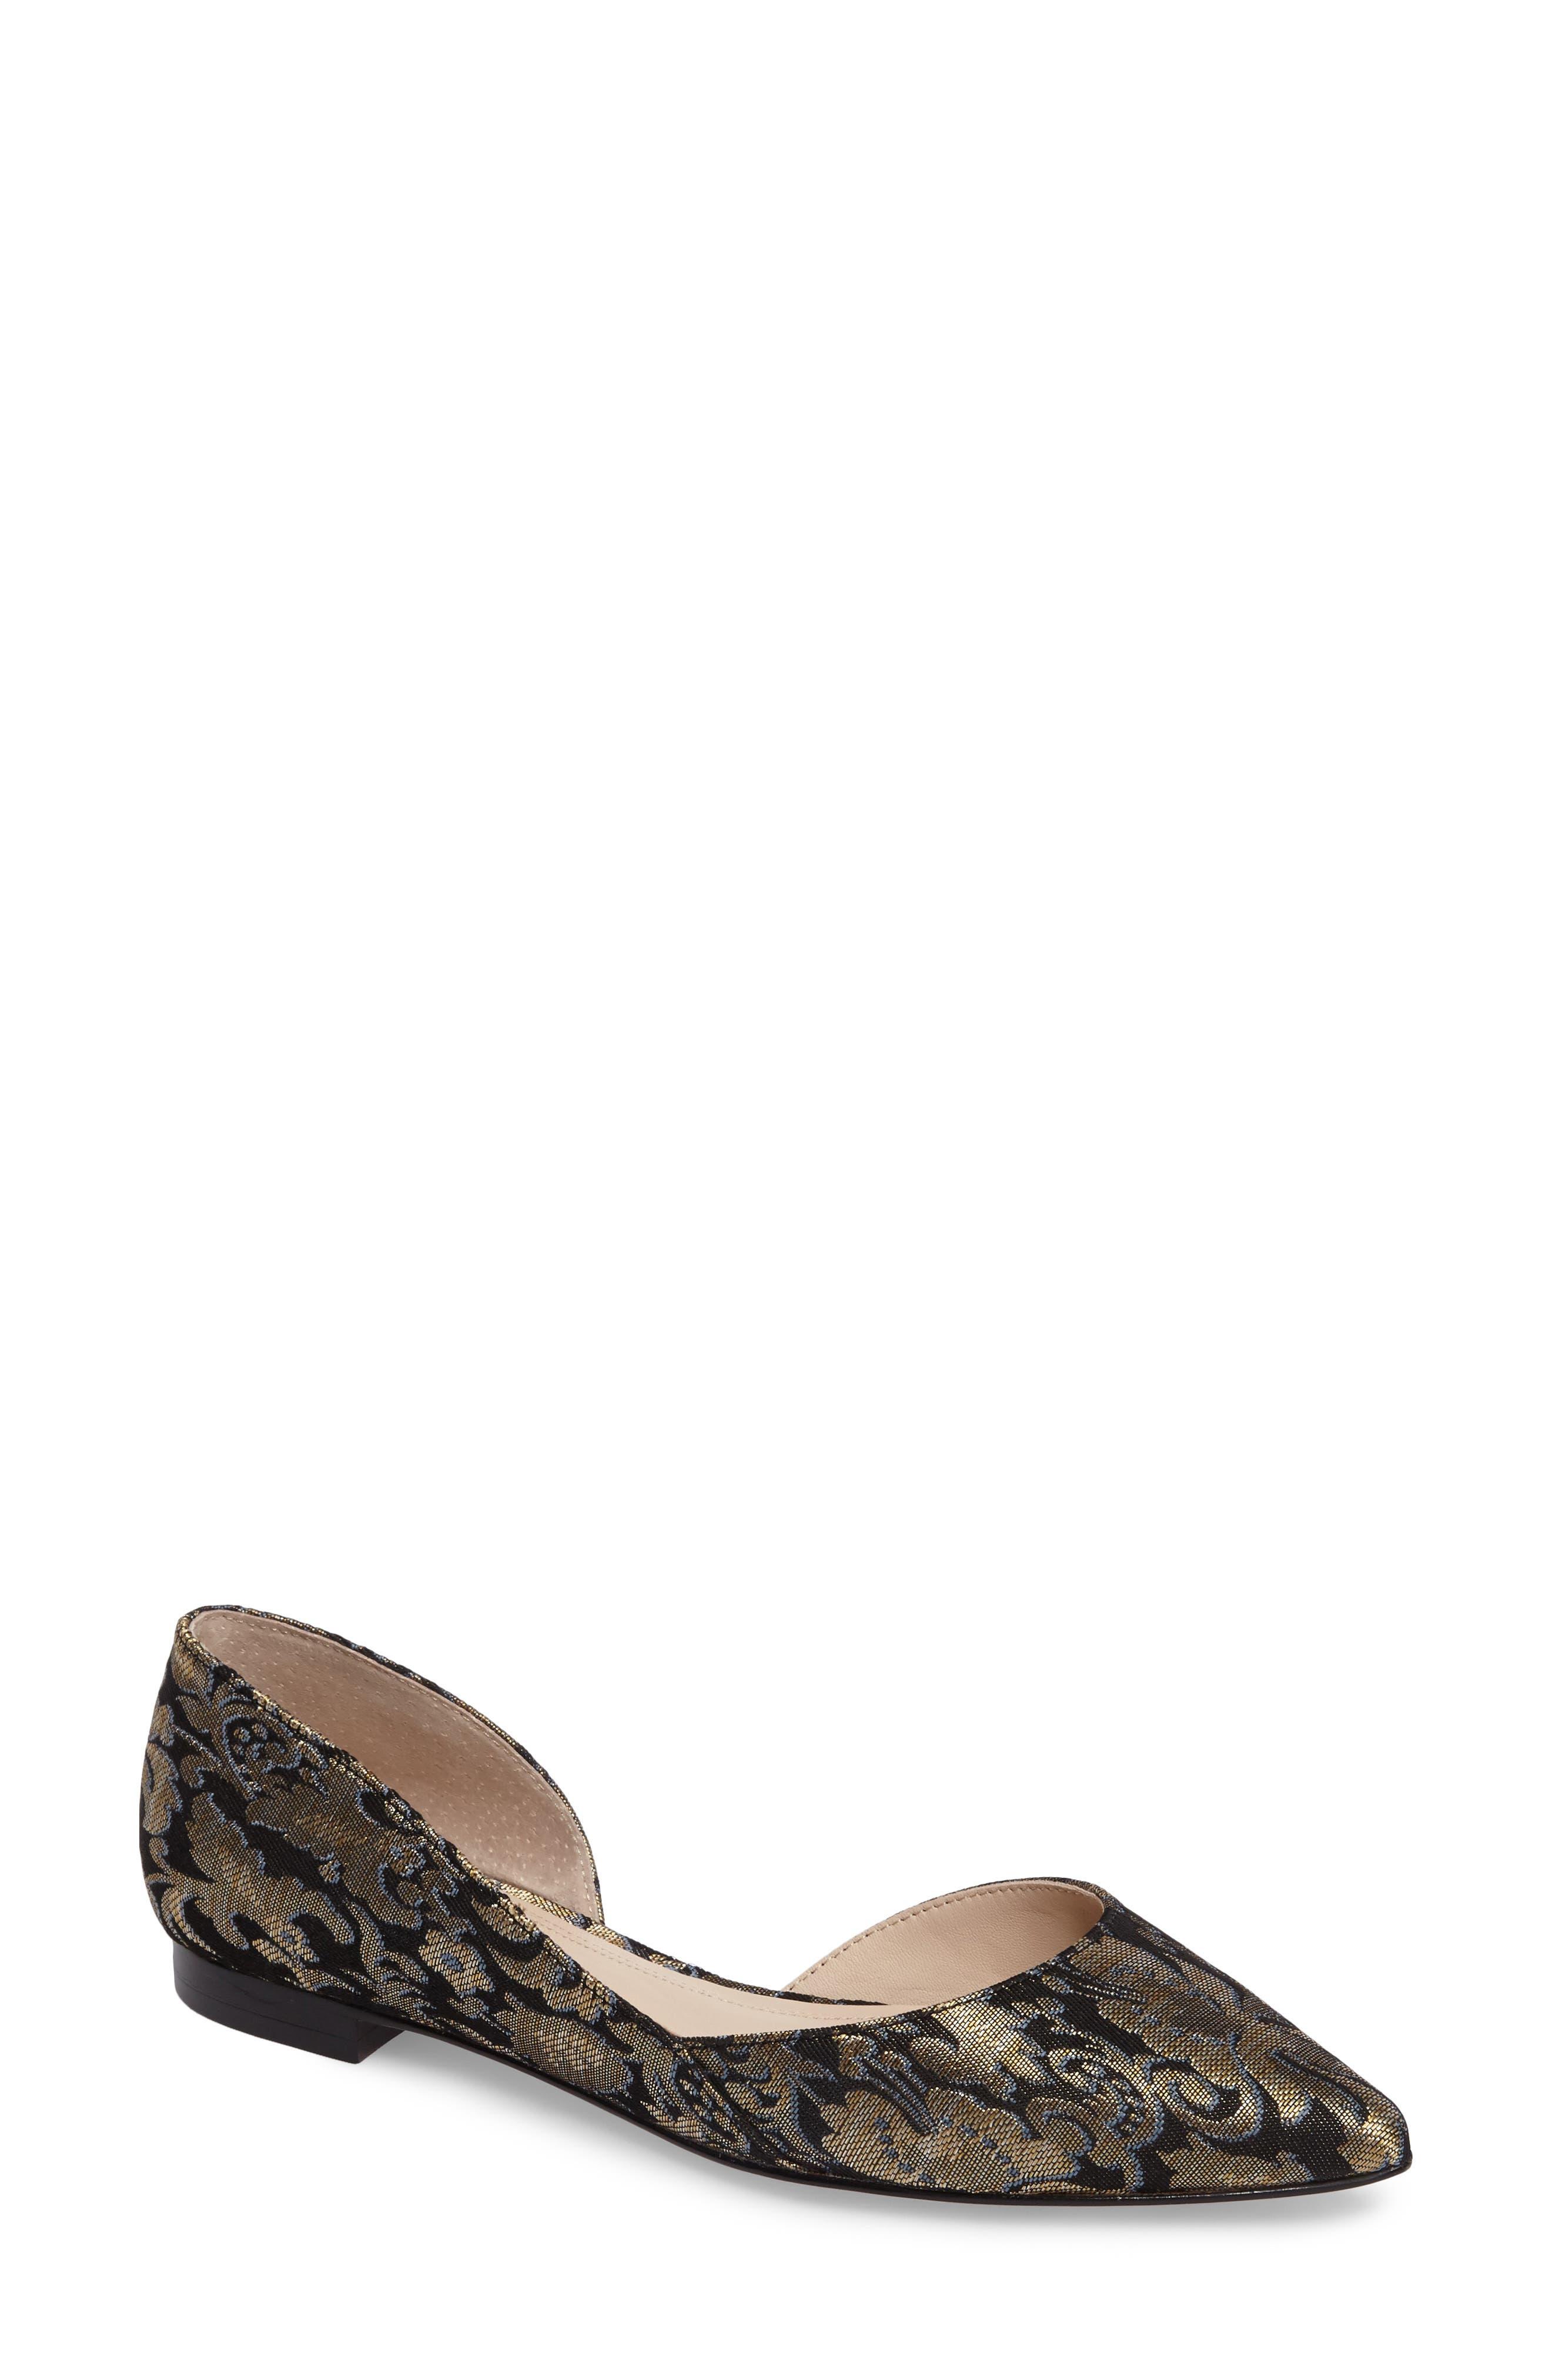 Alternate Image 1 Selected - Marc Fisher LTD 'Sunny' Half d'Orsay Flat (Women)